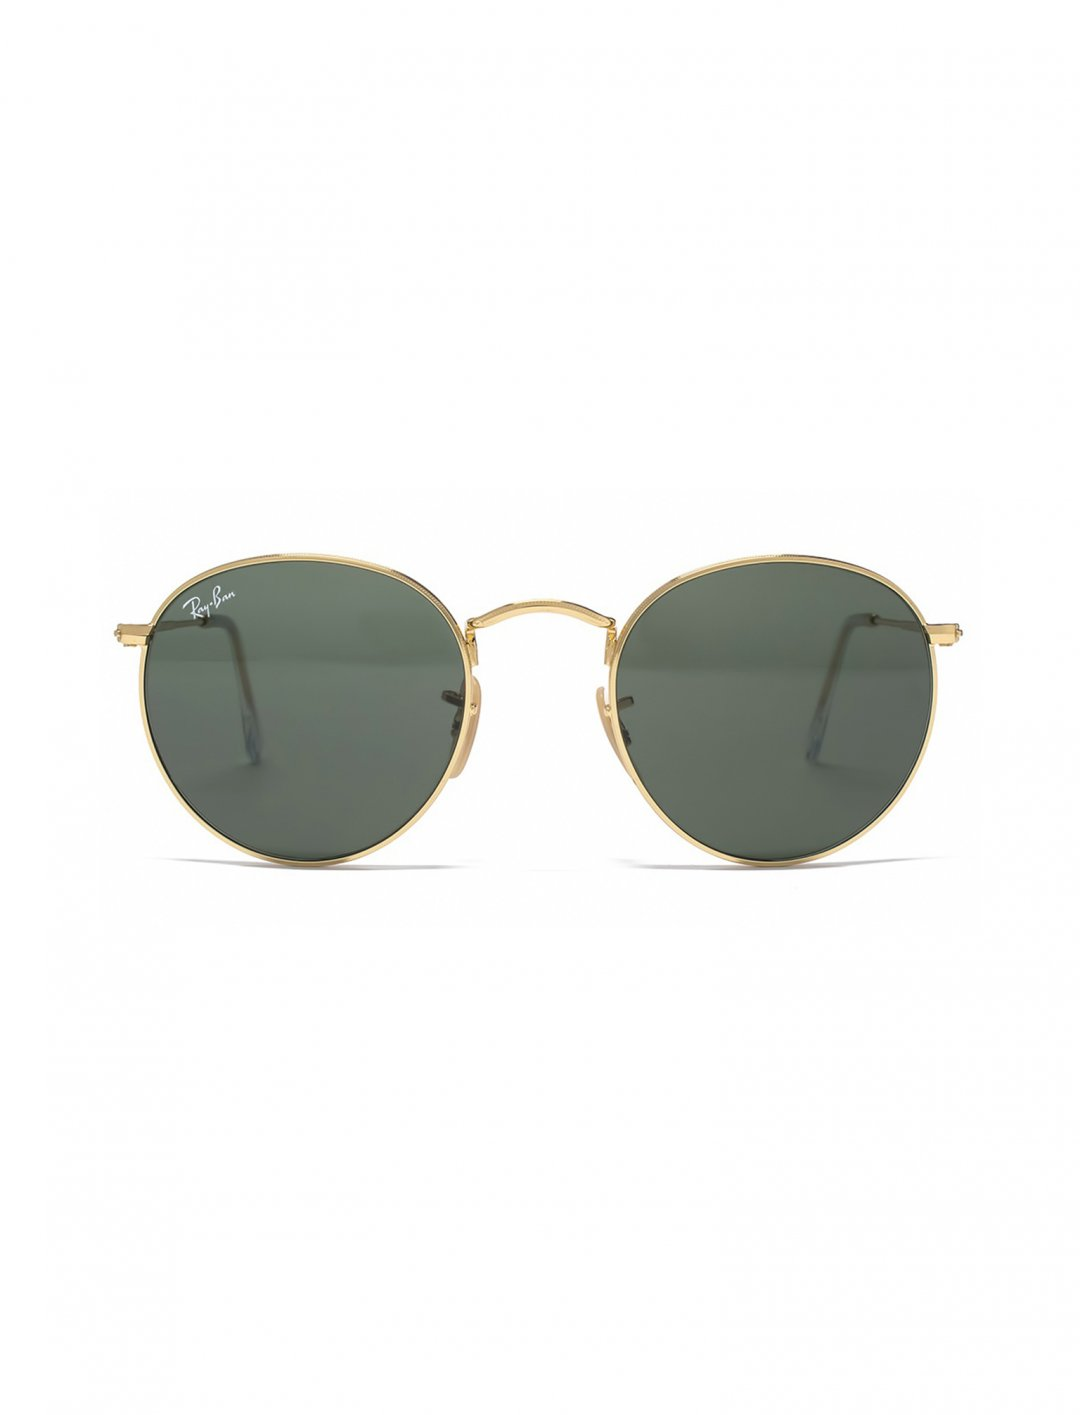 Manj Musik' Sunglasses Accessories Ray-Ban